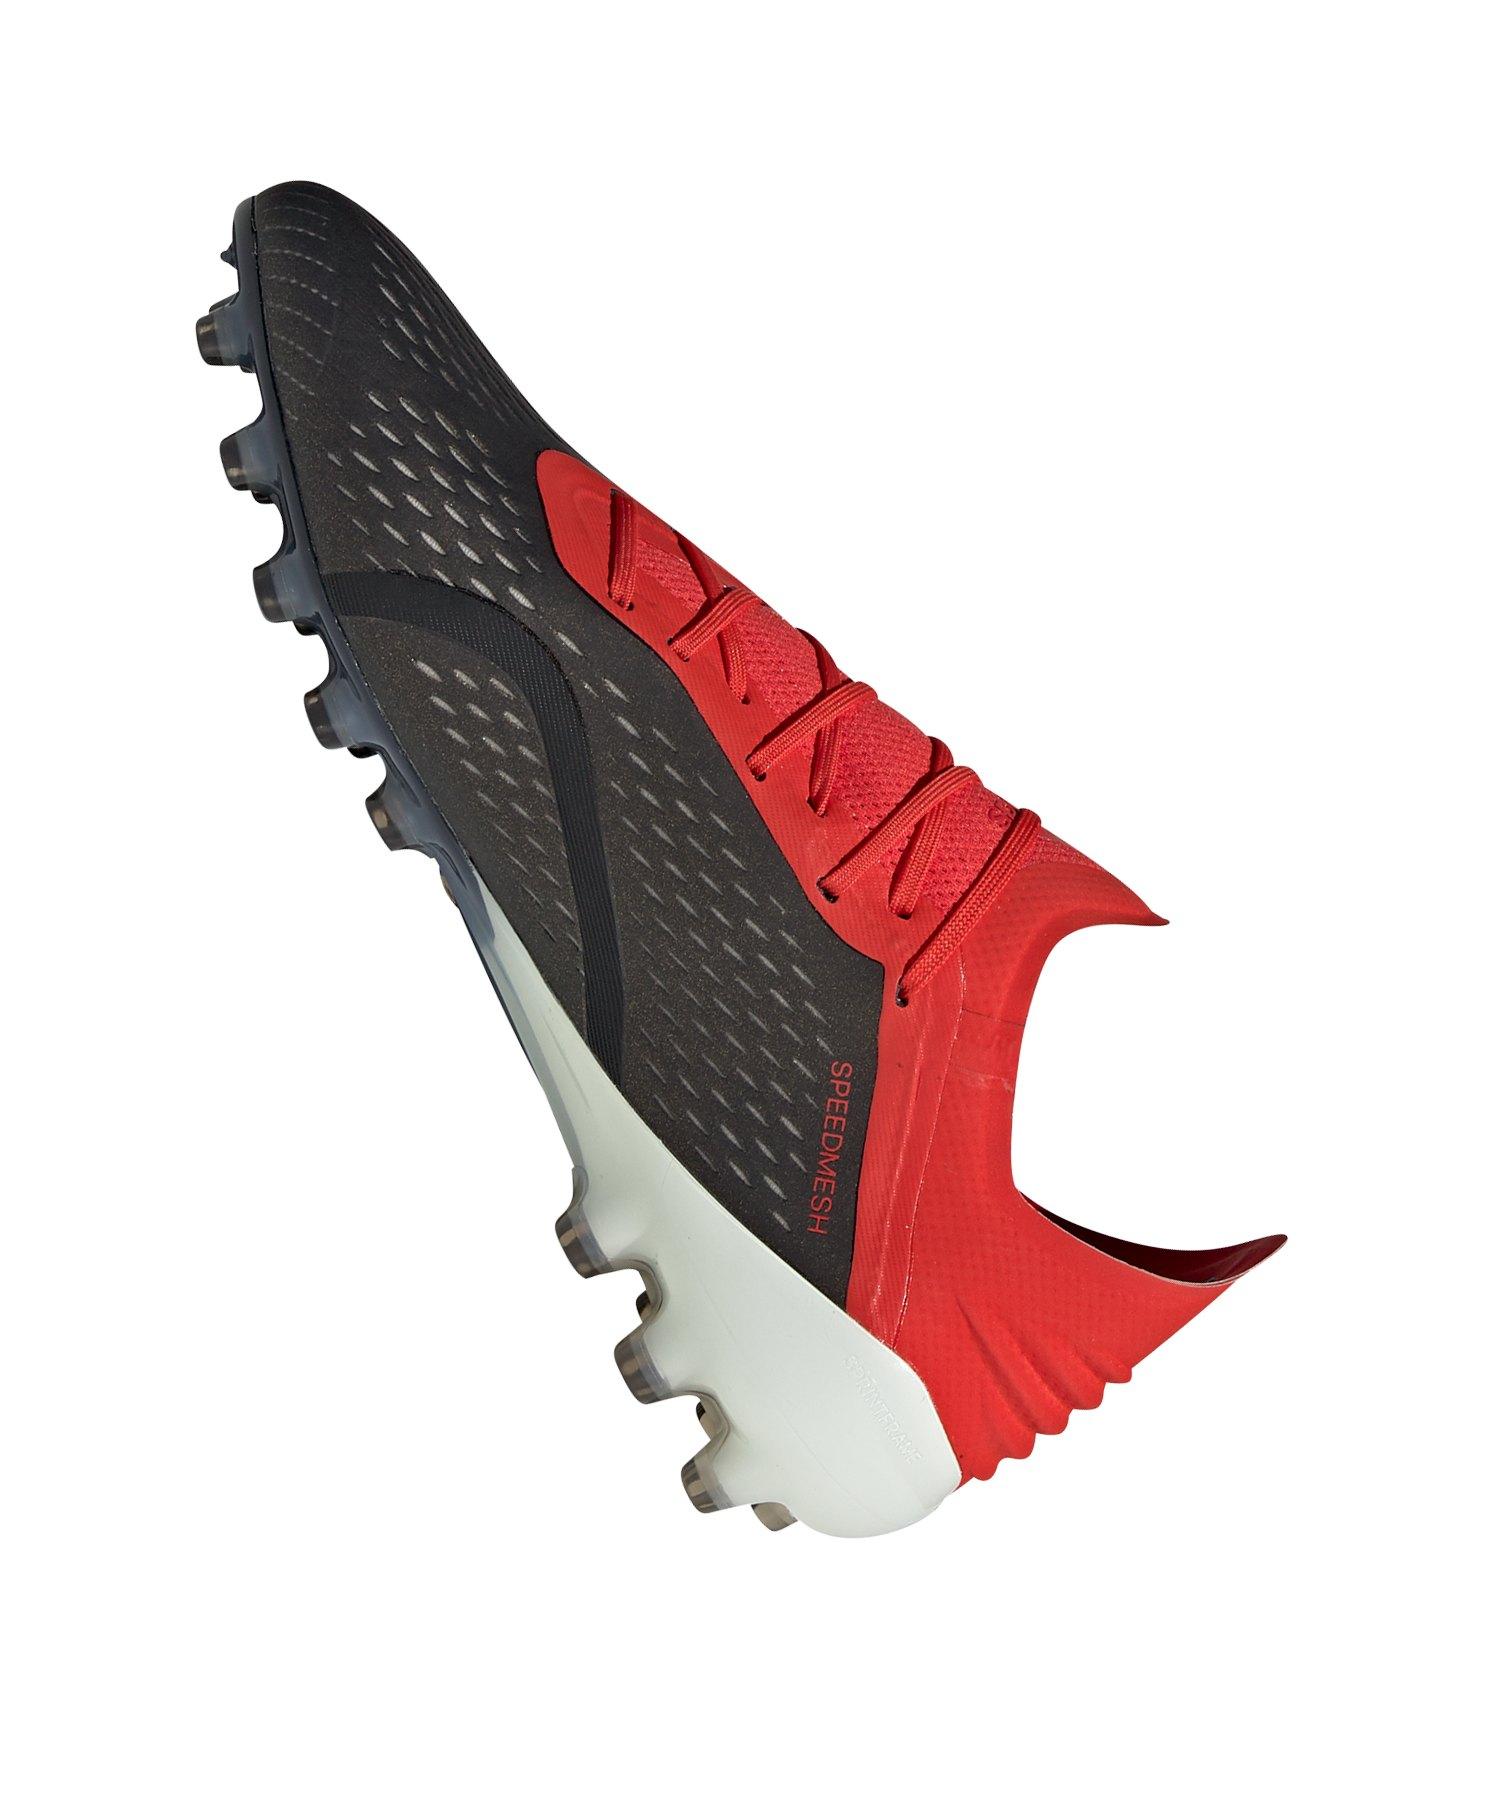 adidas X 18.1 AG Schwarz Rot